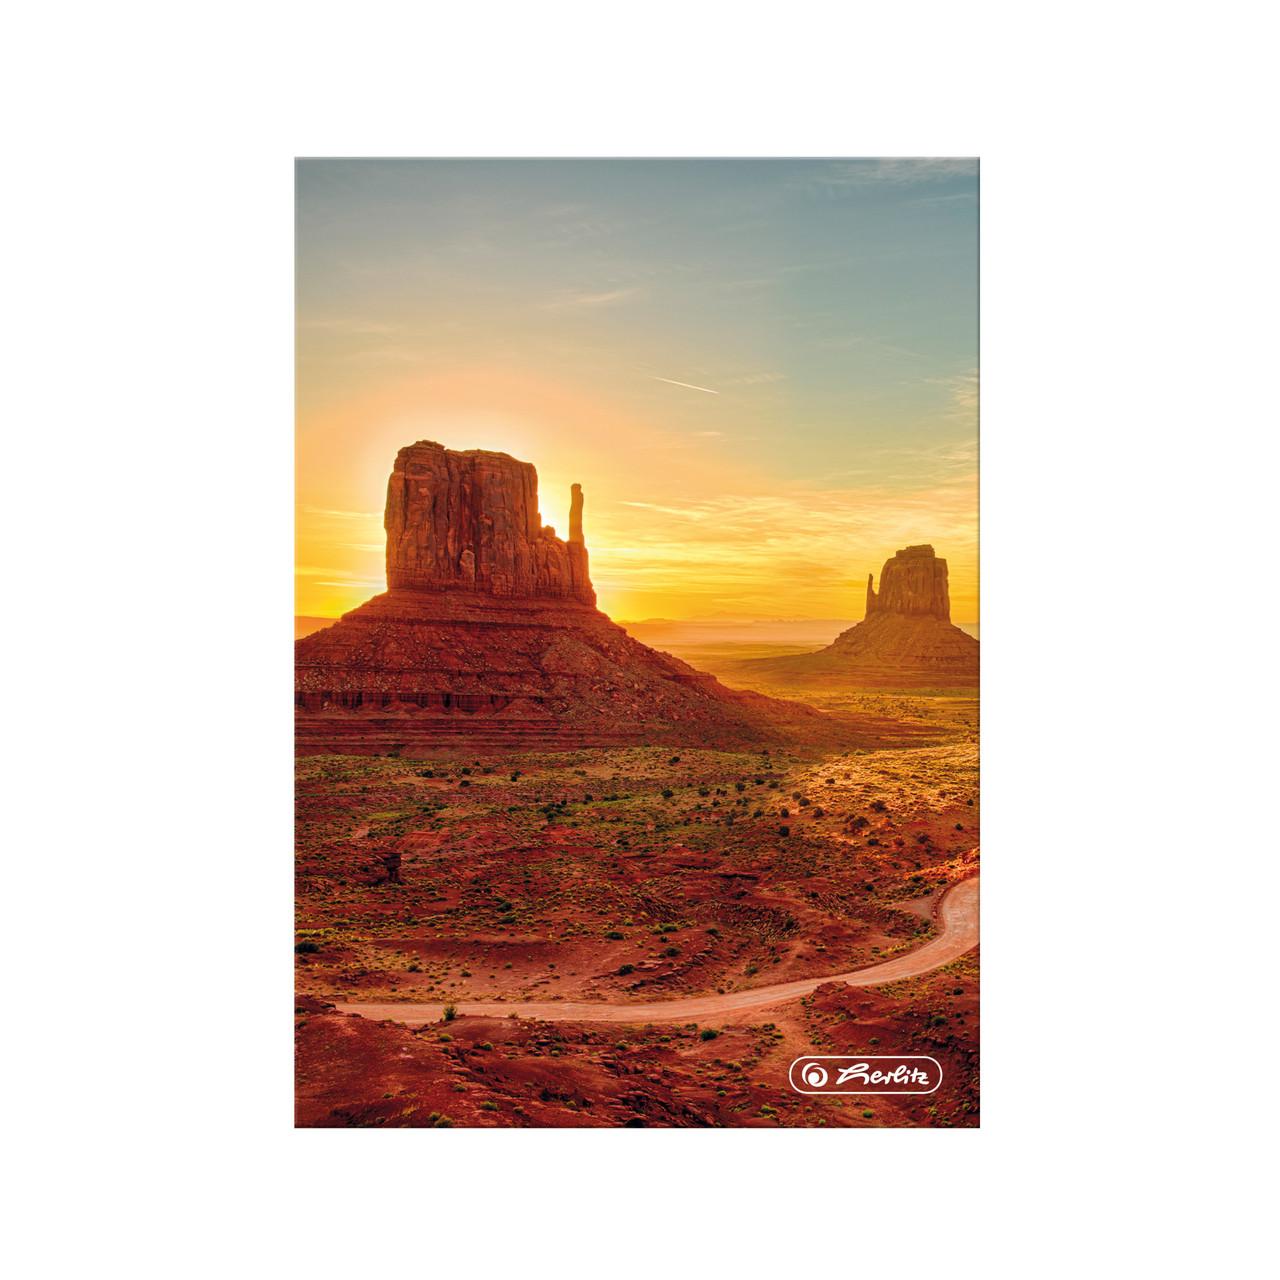 Блокнот Herlitz А5 96 листов клетка Dream Landscape Аризона Долина Монументов